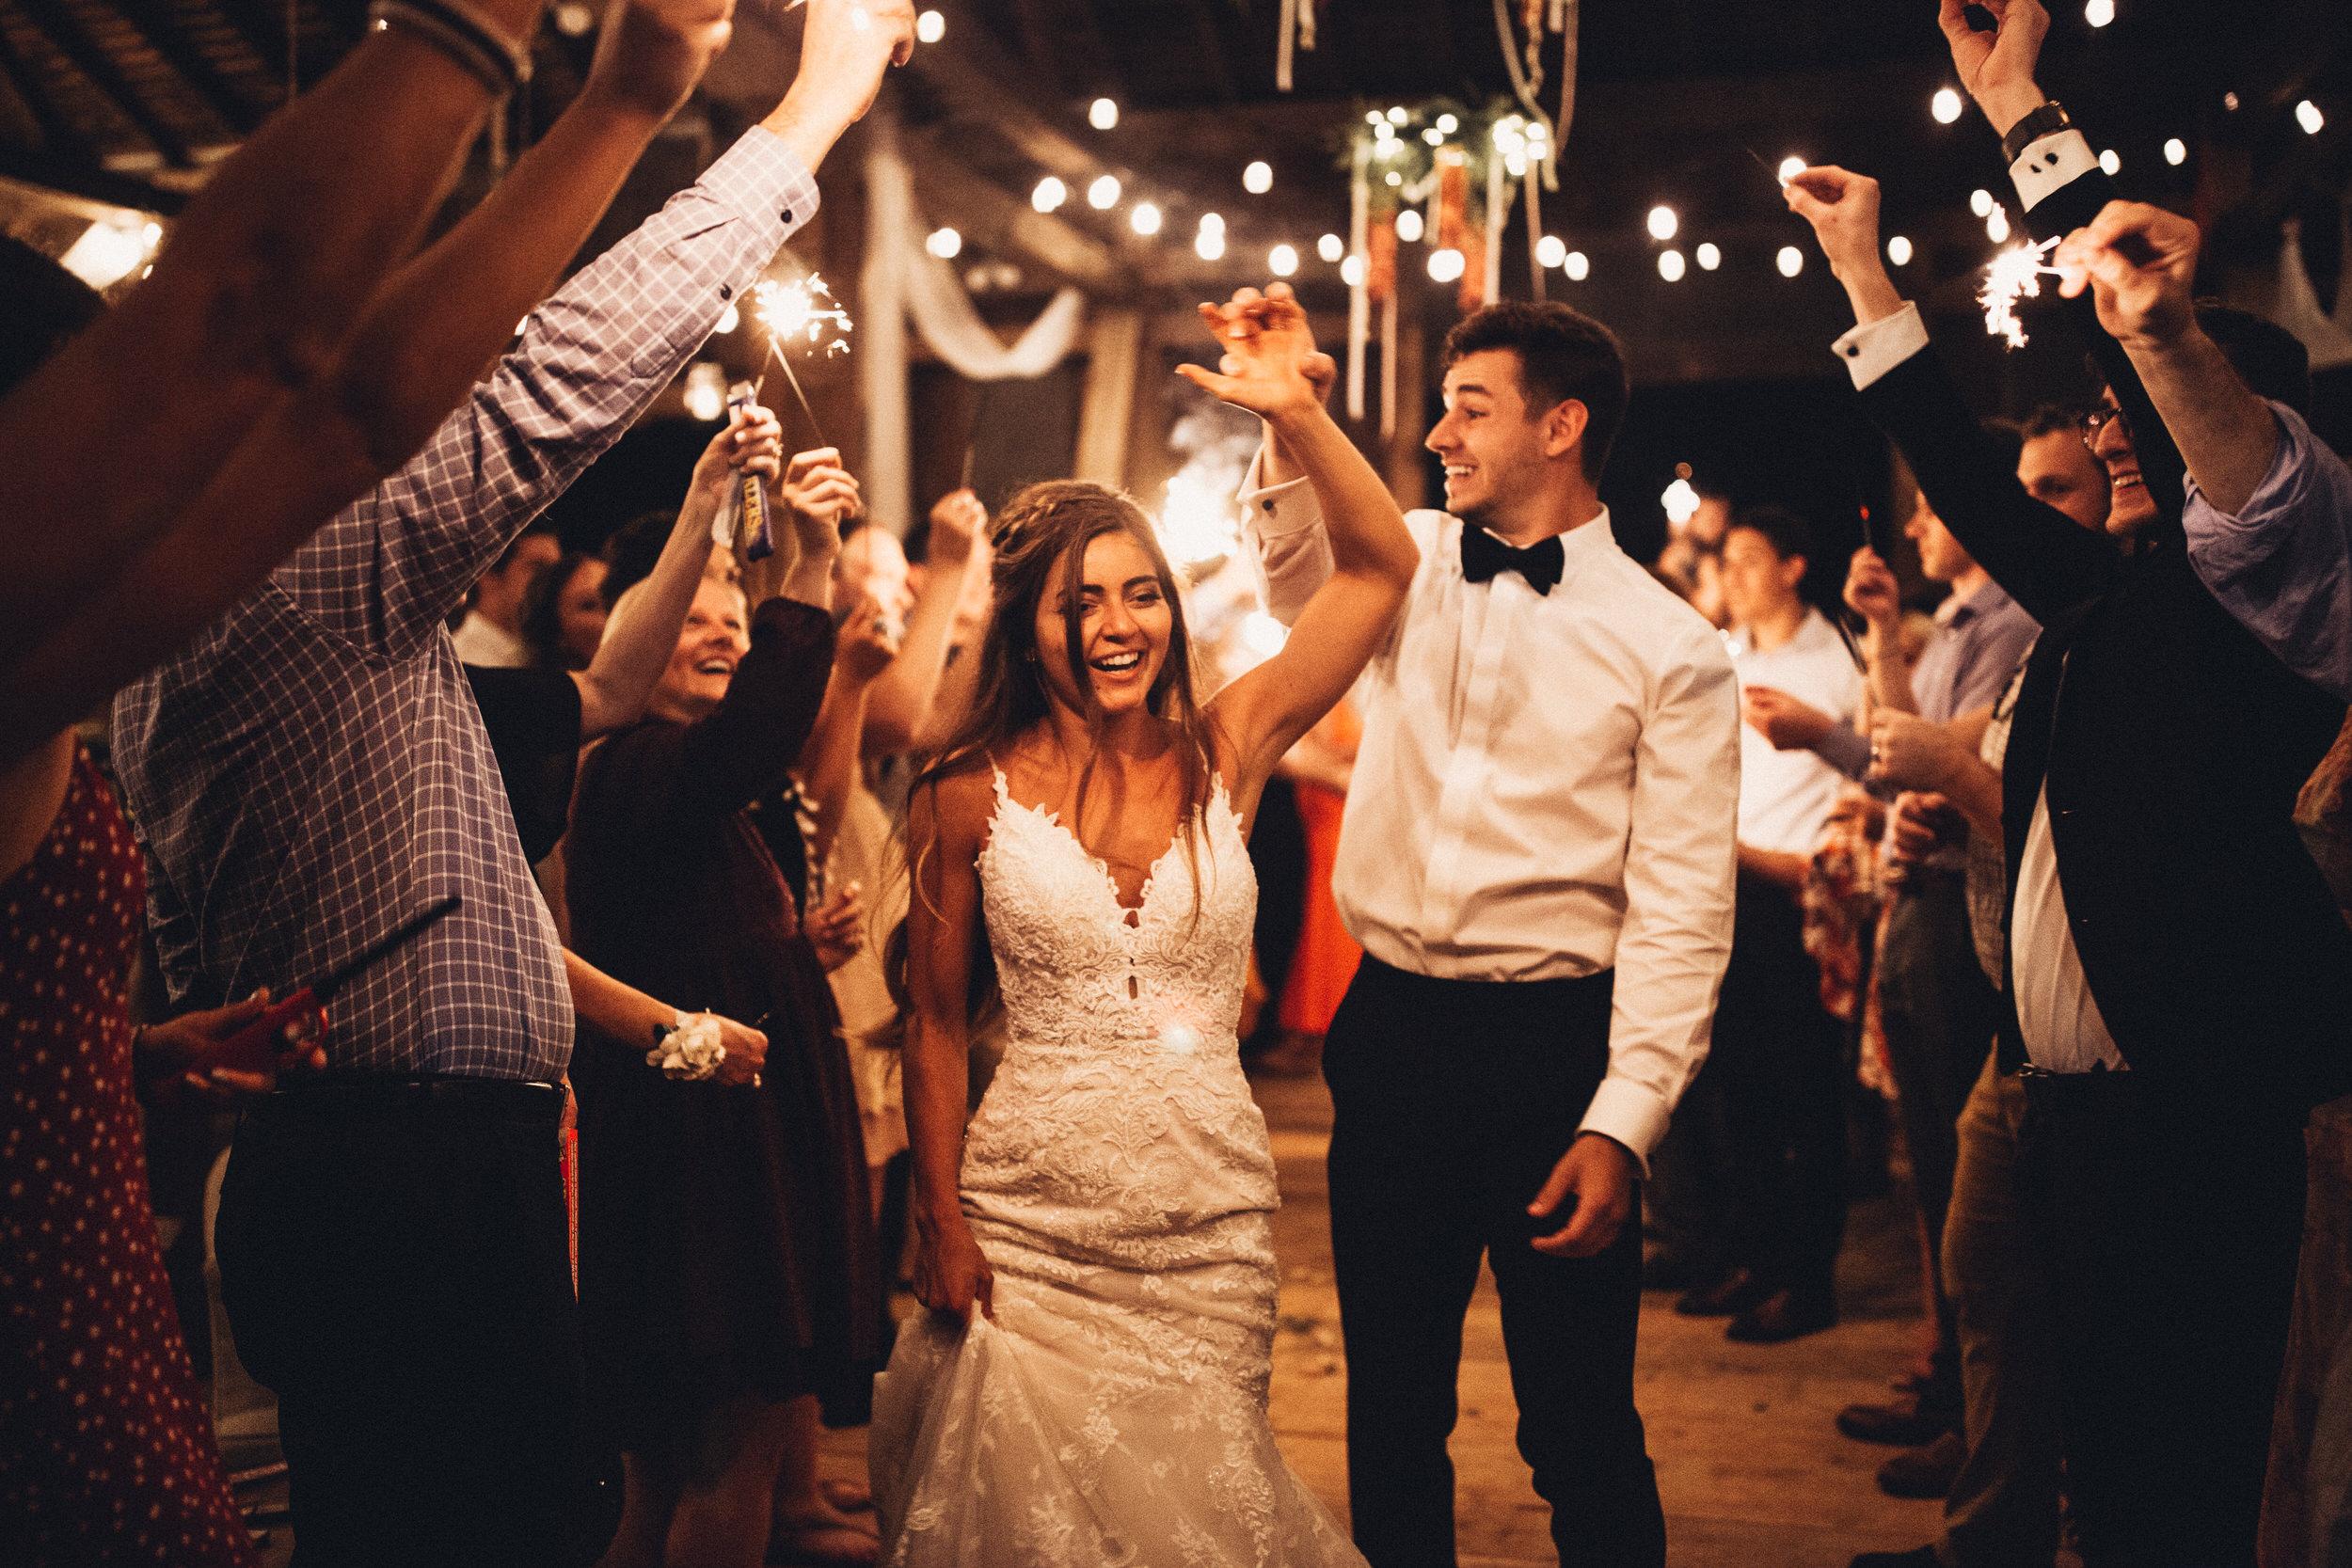 Wedding Sparkler Send-off